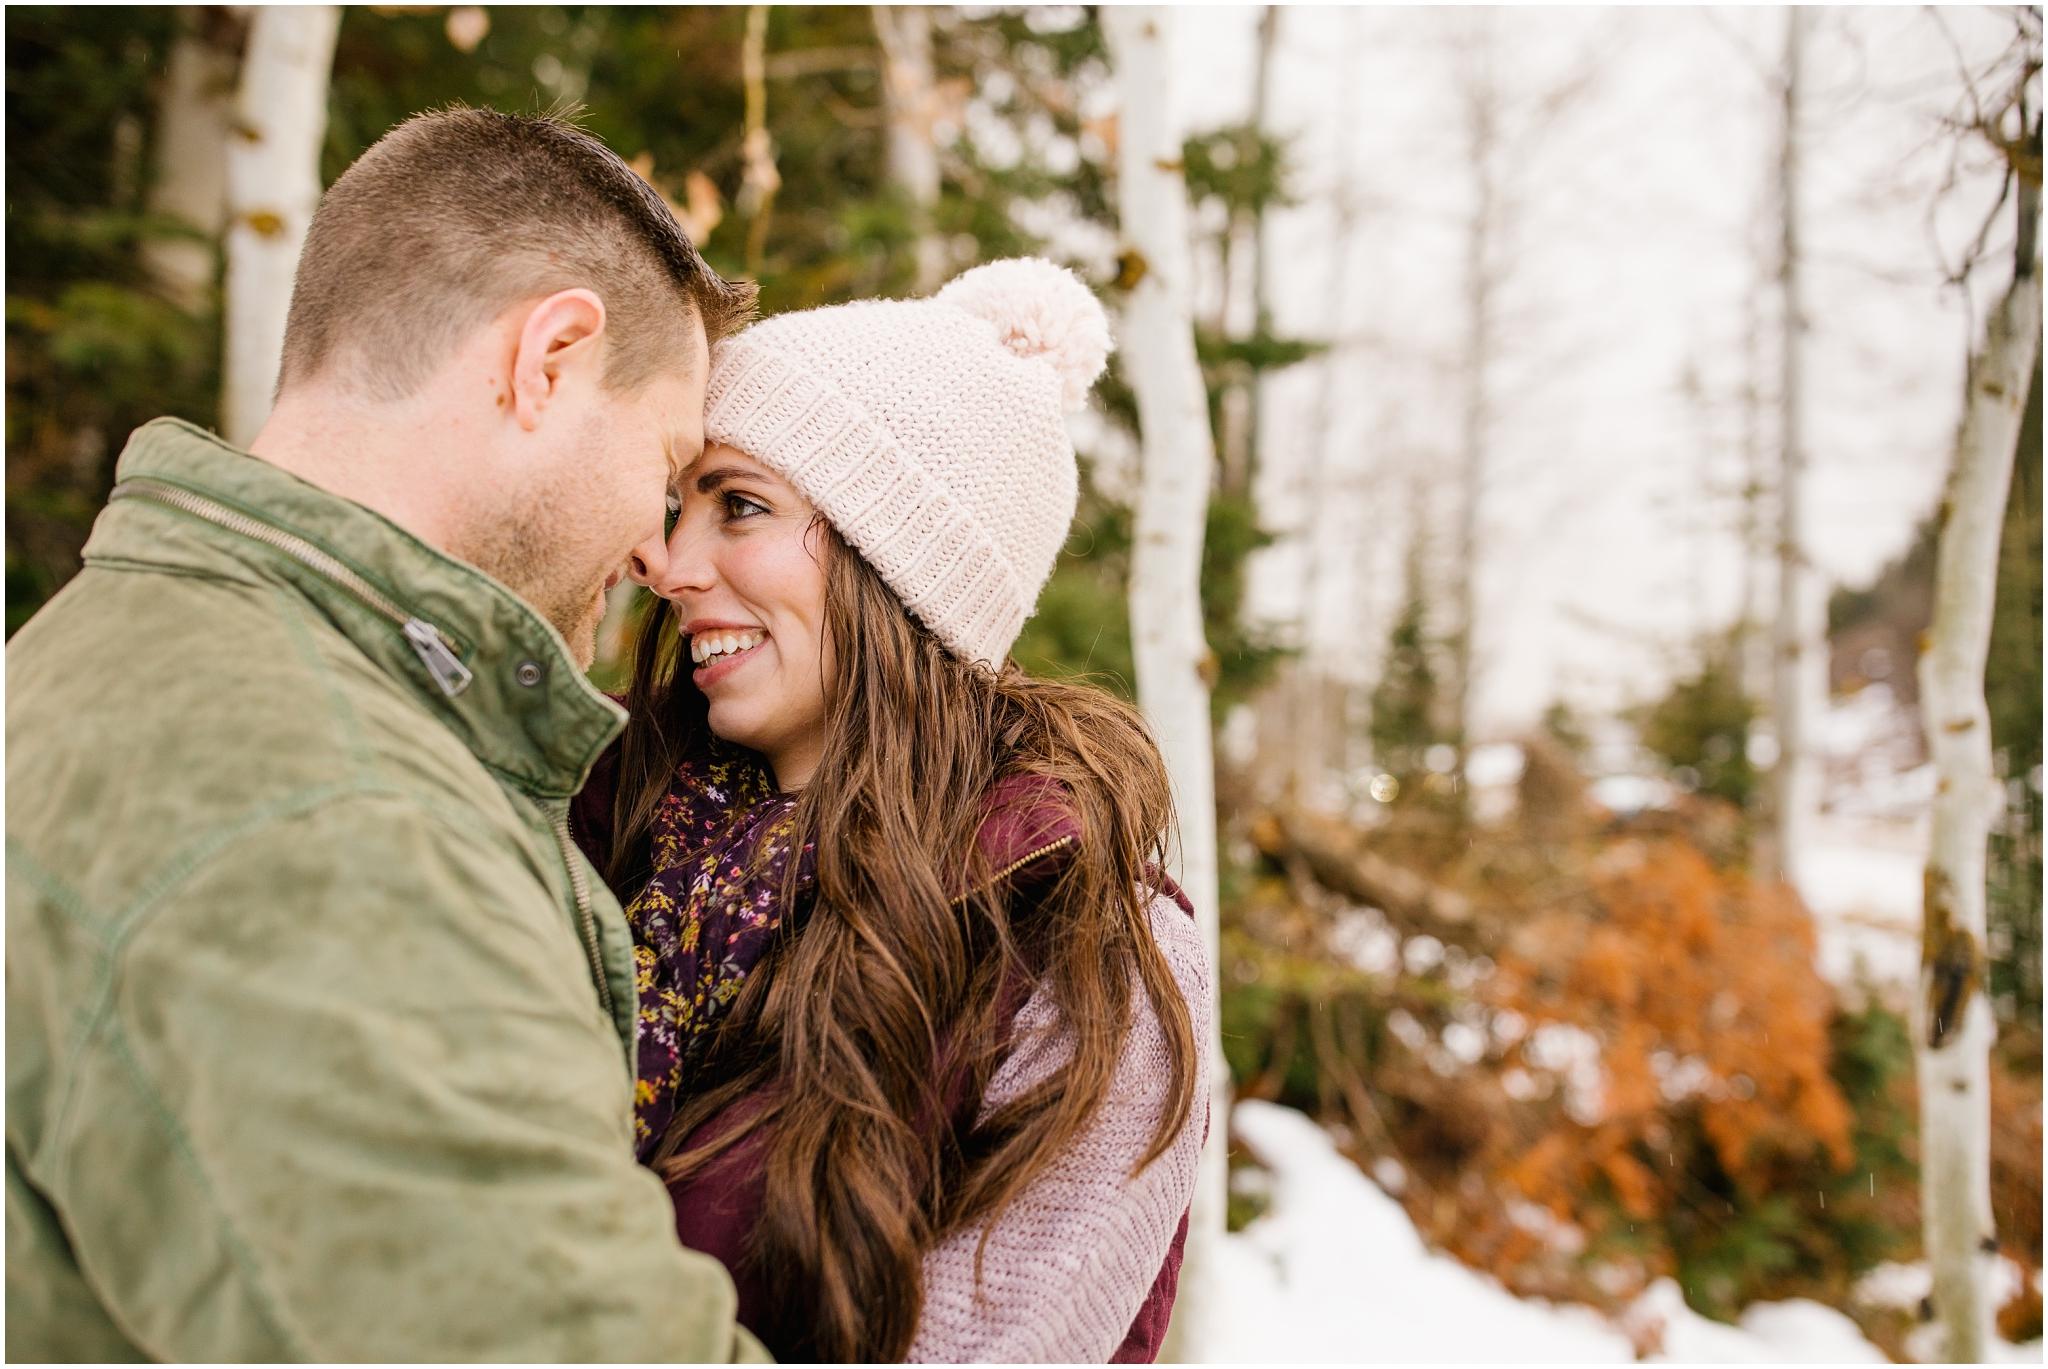 SS-Engagements-86_Lizzie-B-Imagery-Utah-Wedding-Photographer-Salt-Lake-City-Park-City-Logan-Utah-Temple.jpg